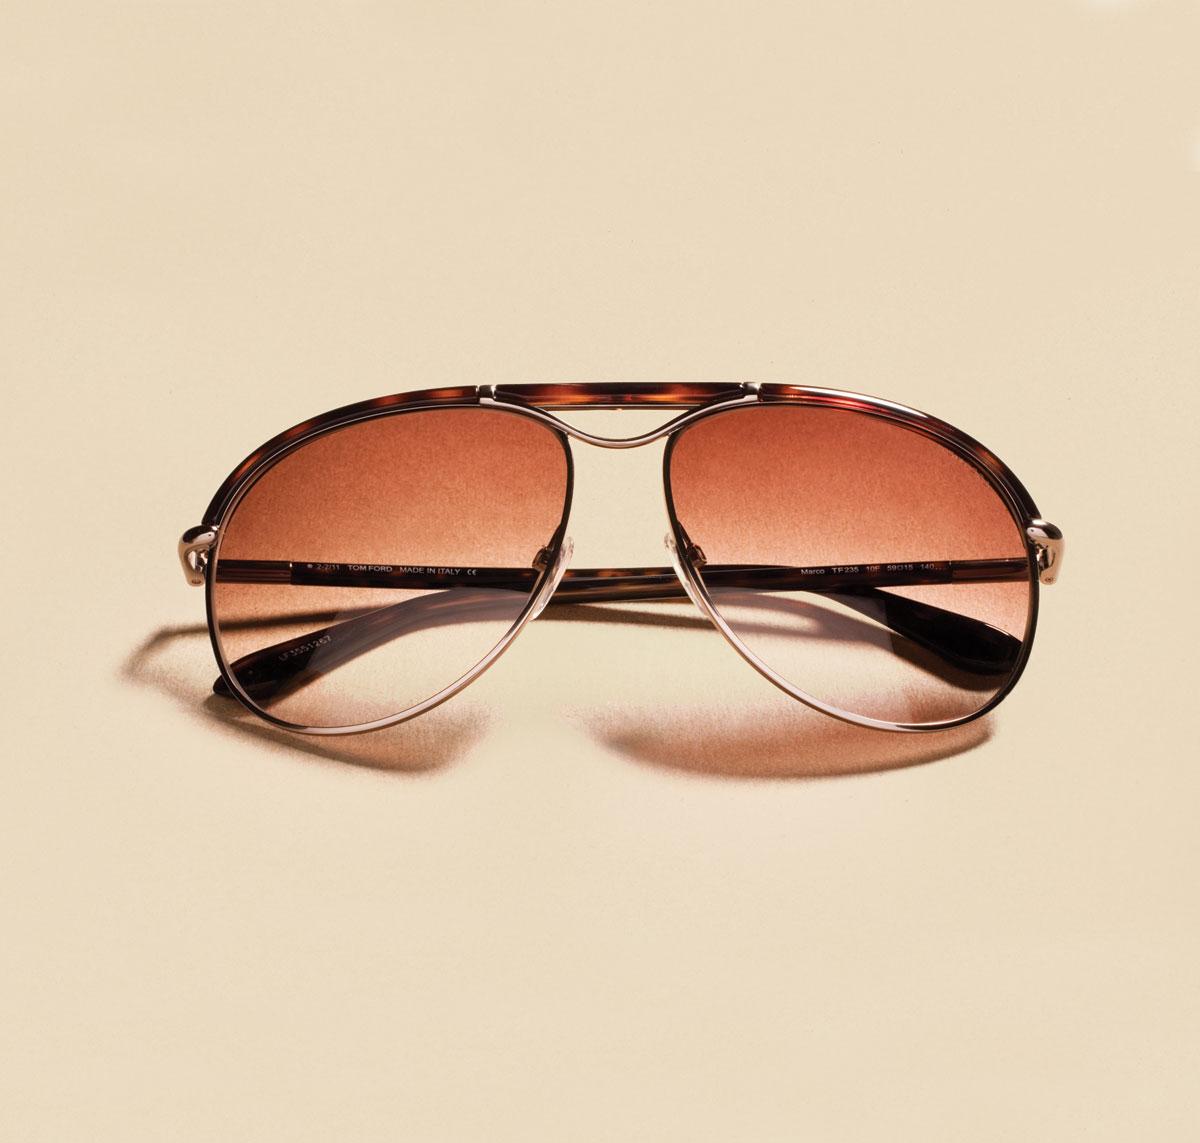 m08-accessoires-lunette-tom-ford-lunetterie-doyle